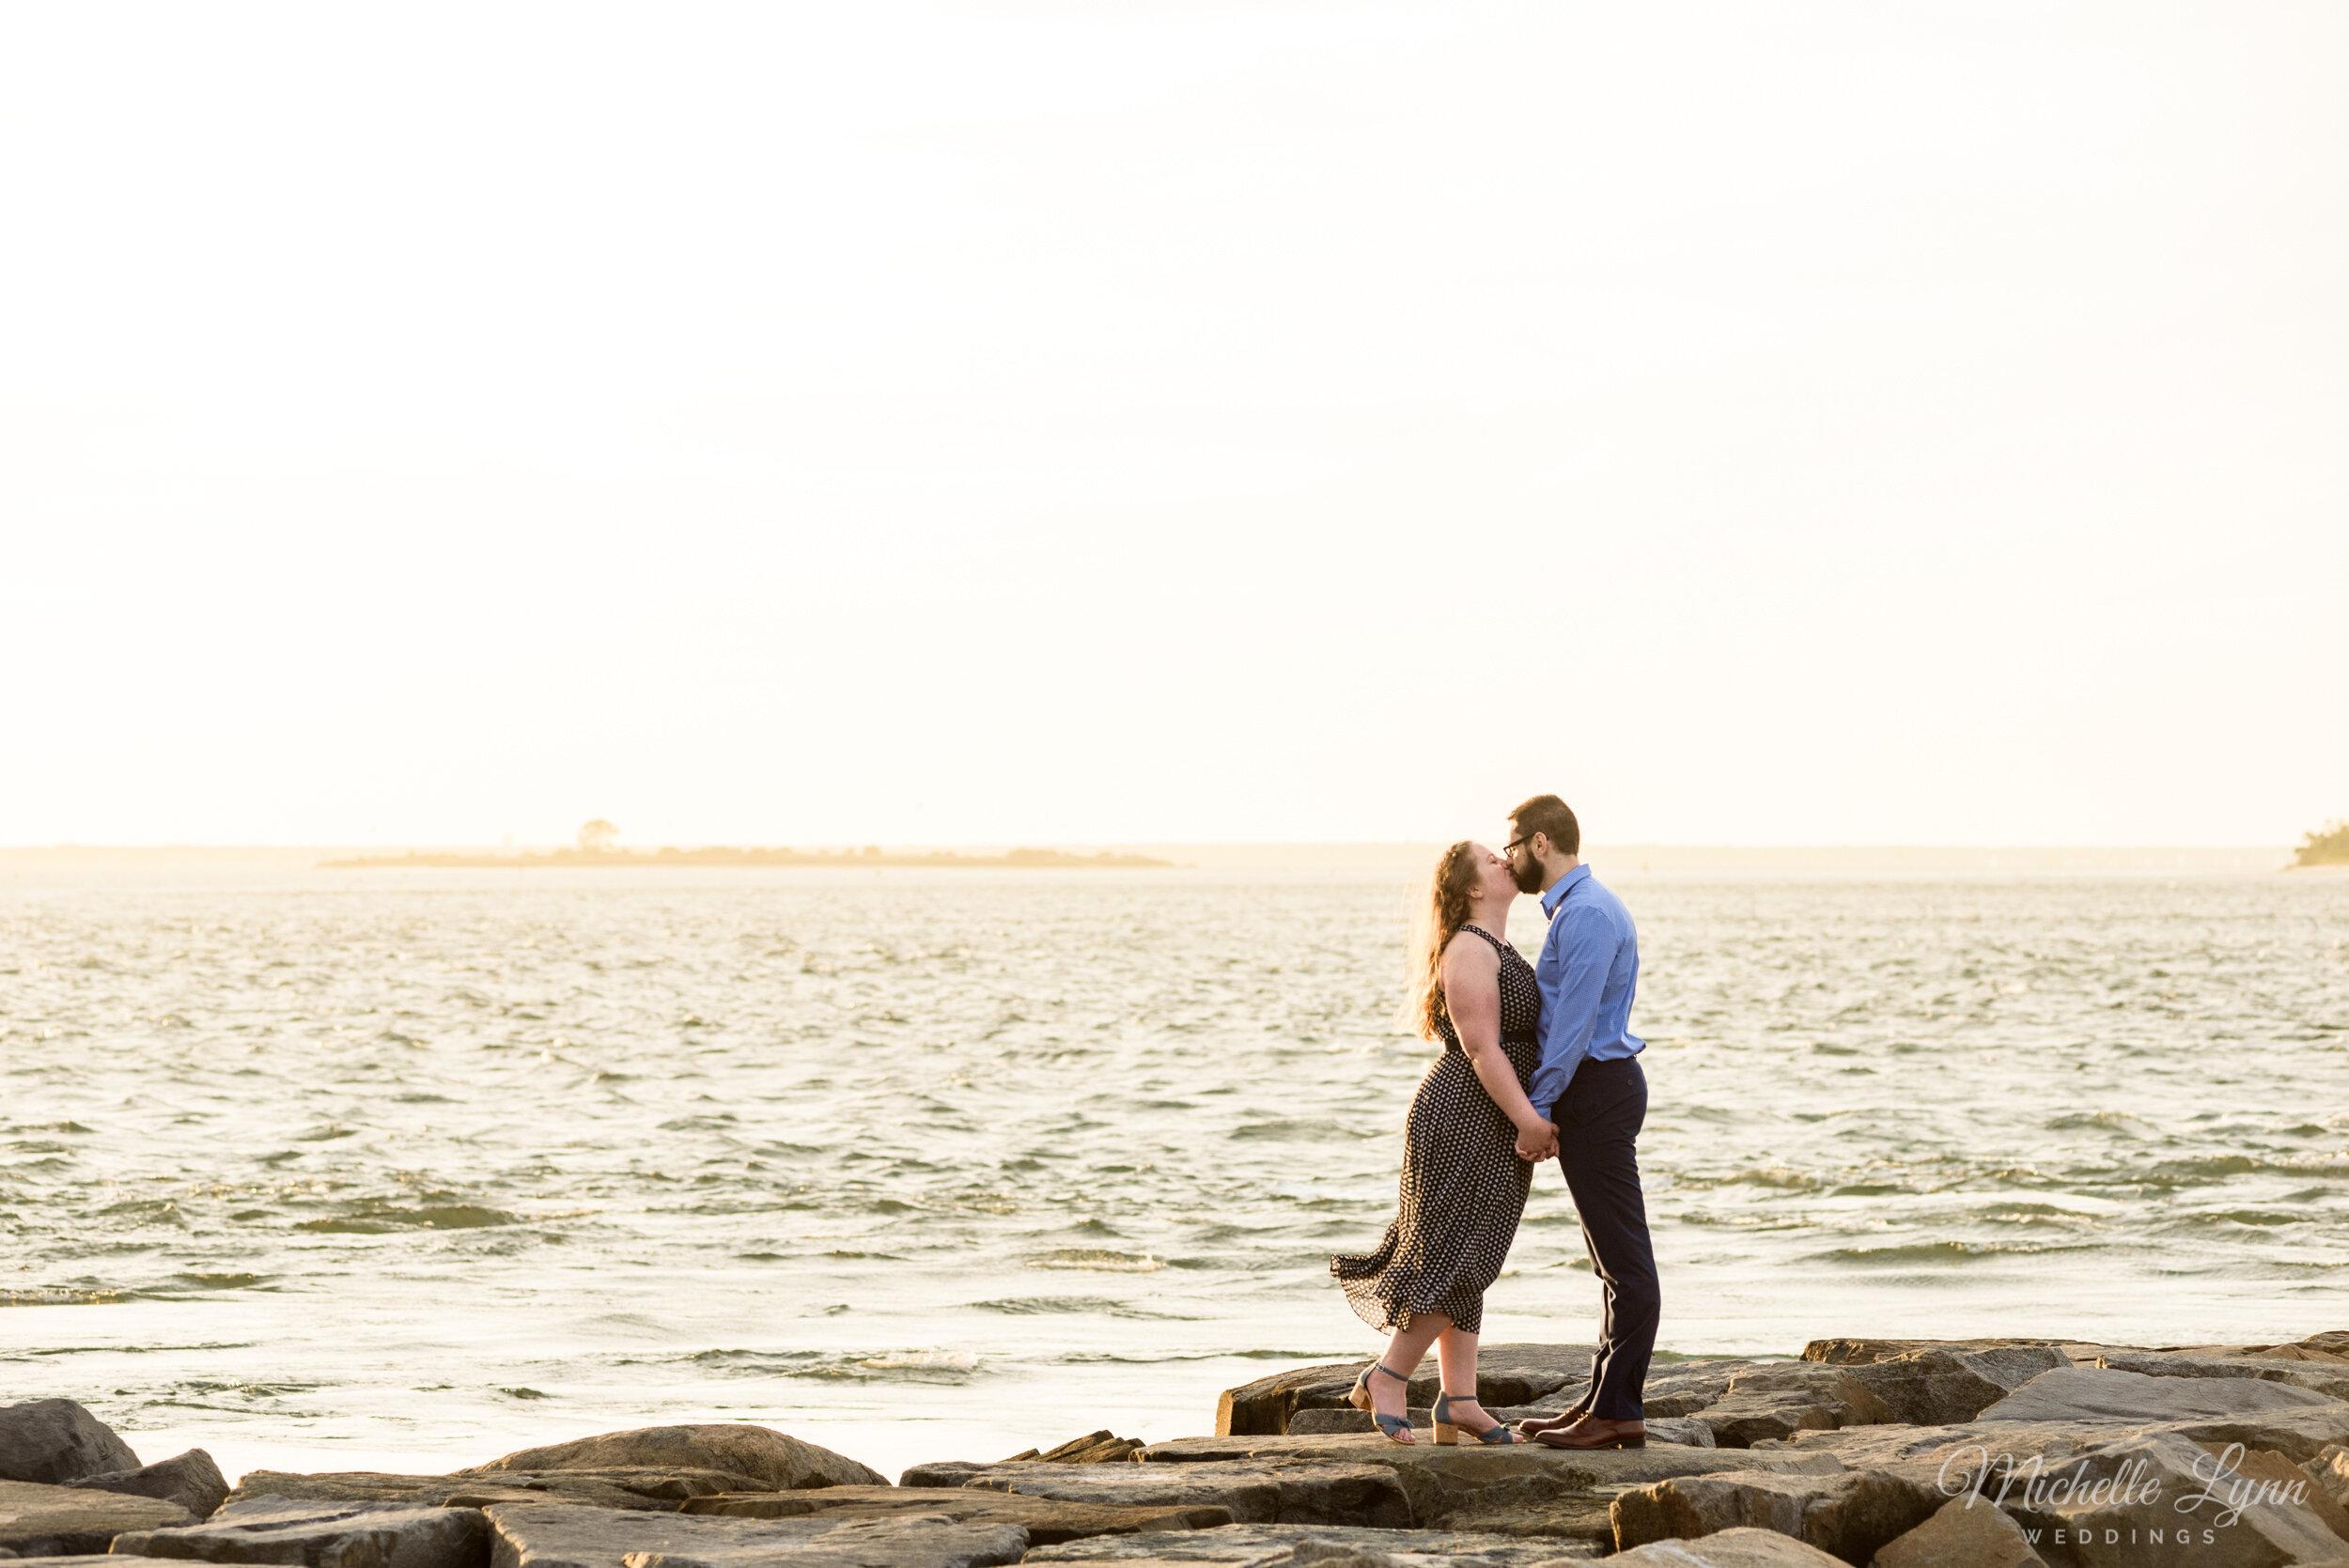 barnegat-lighthouse-engagement-photos-michelle-lynn-weddings-14.jpg